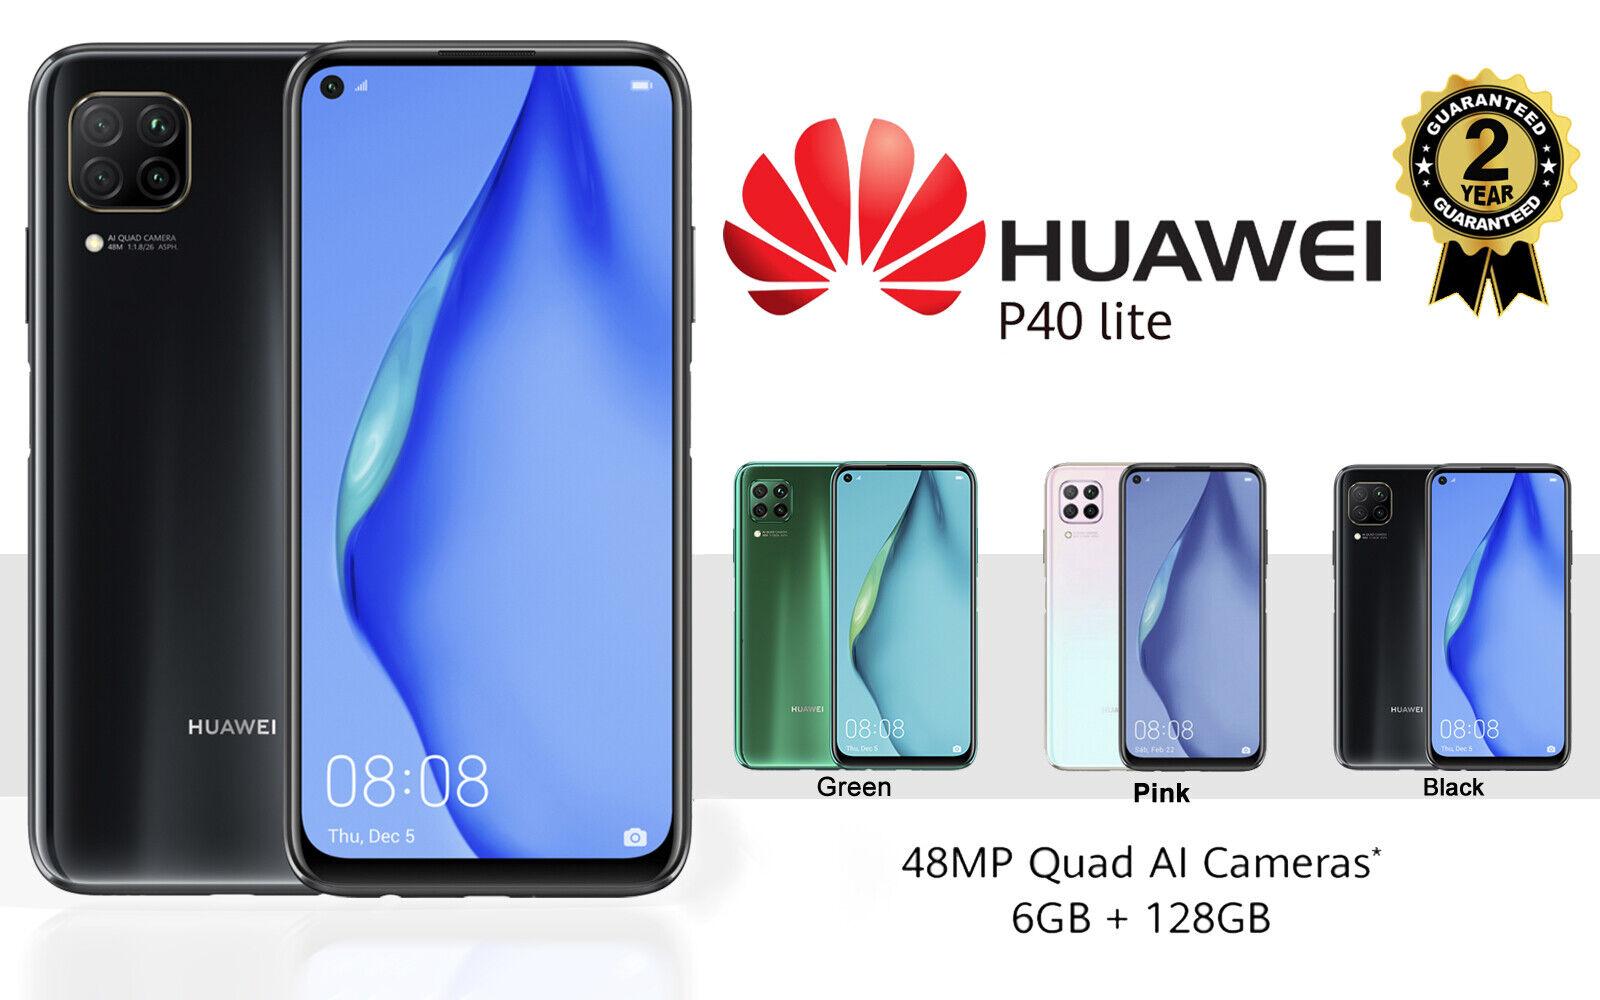 Android Phone - NEW HUAWEI P40 LITE DUAL SIM FREE 128GB 4G LTE UNLOCKED PHONE SEALED BLACK GREEN